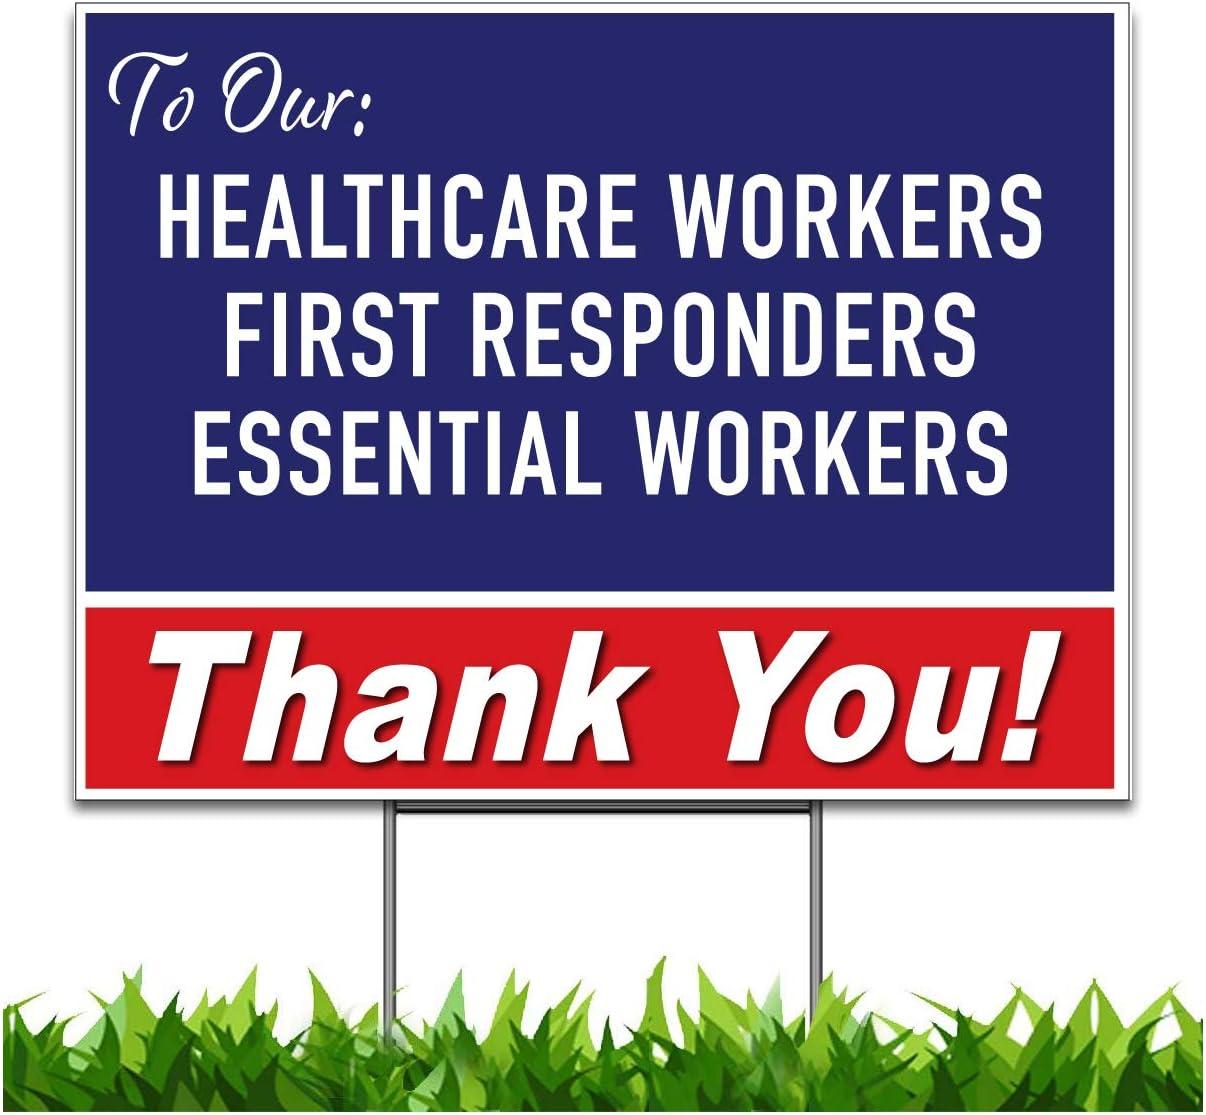 Moonlight4225 新品未使用正規品 Thank You Stay 品質検査済 Safe Health First Care Responders